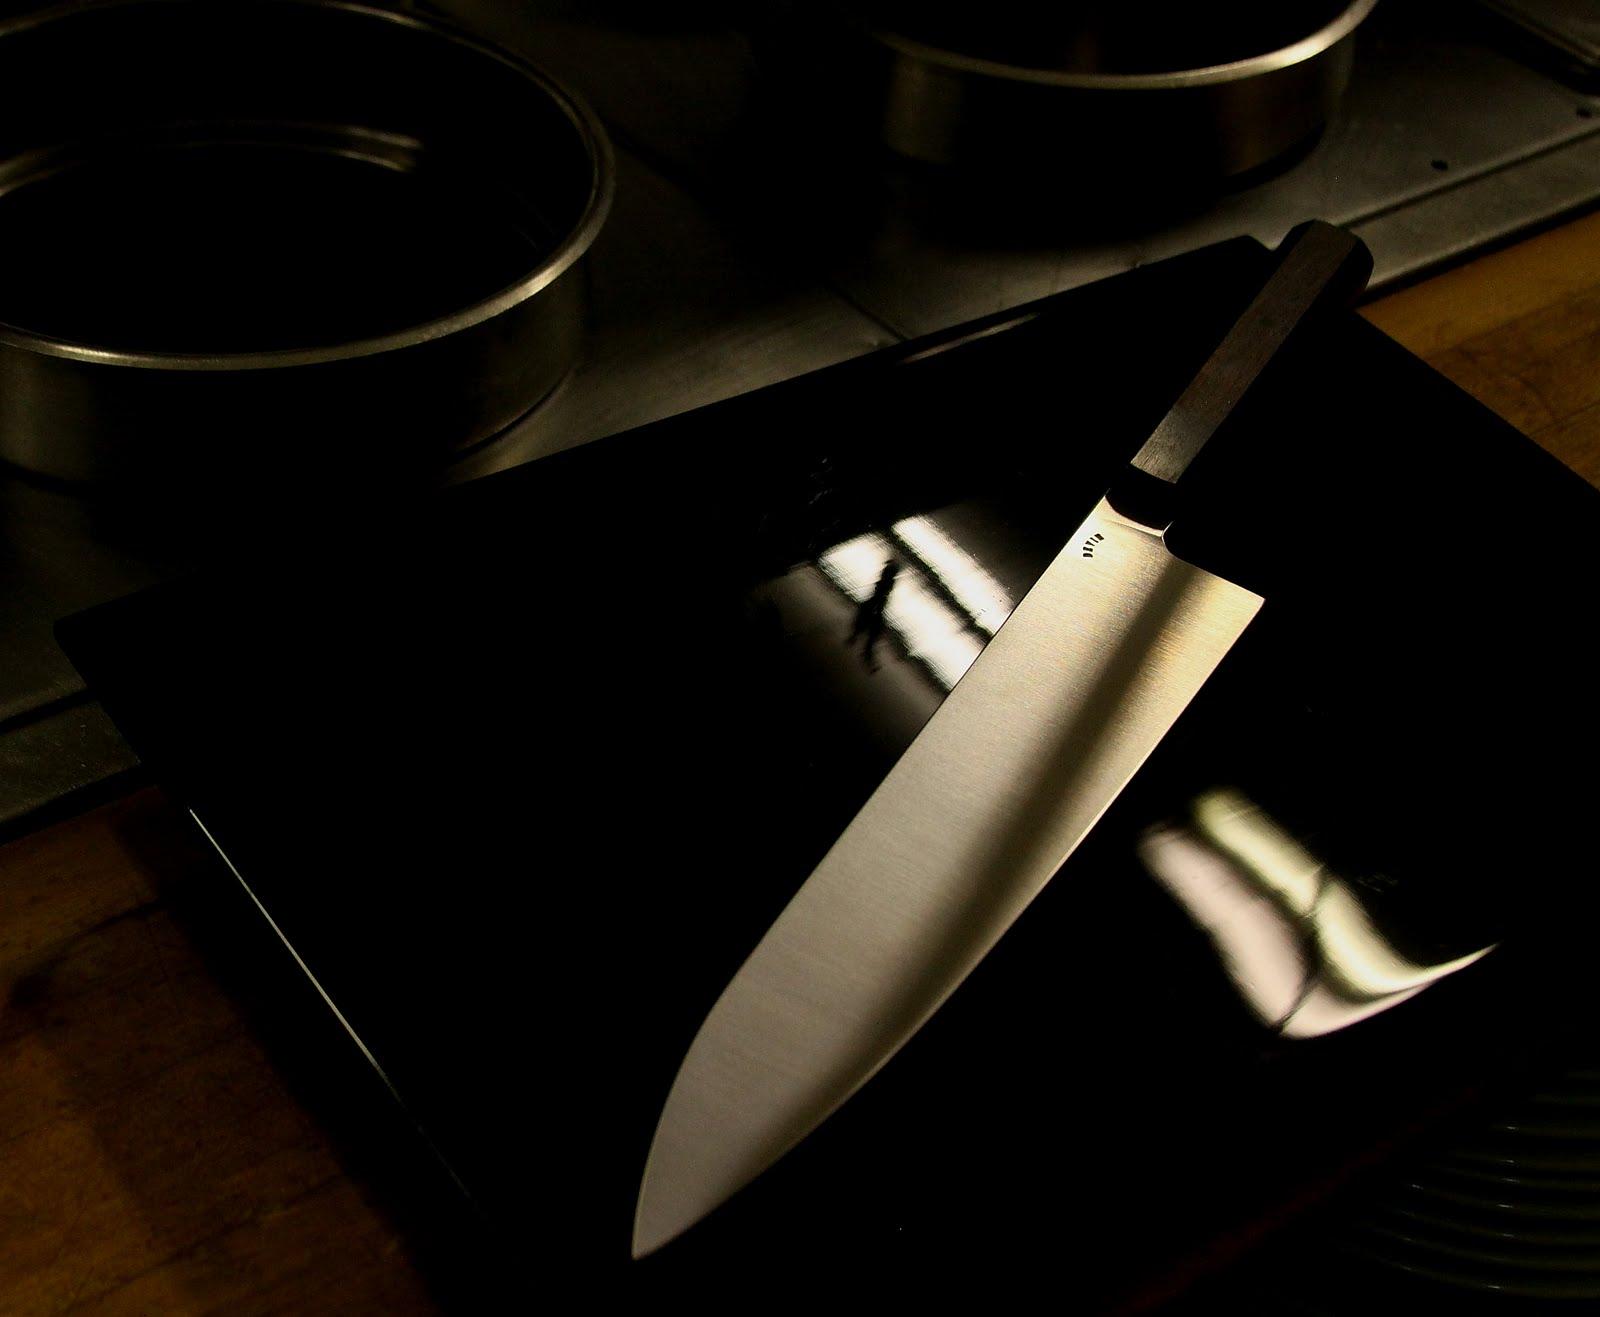 Knifeforums Protoype